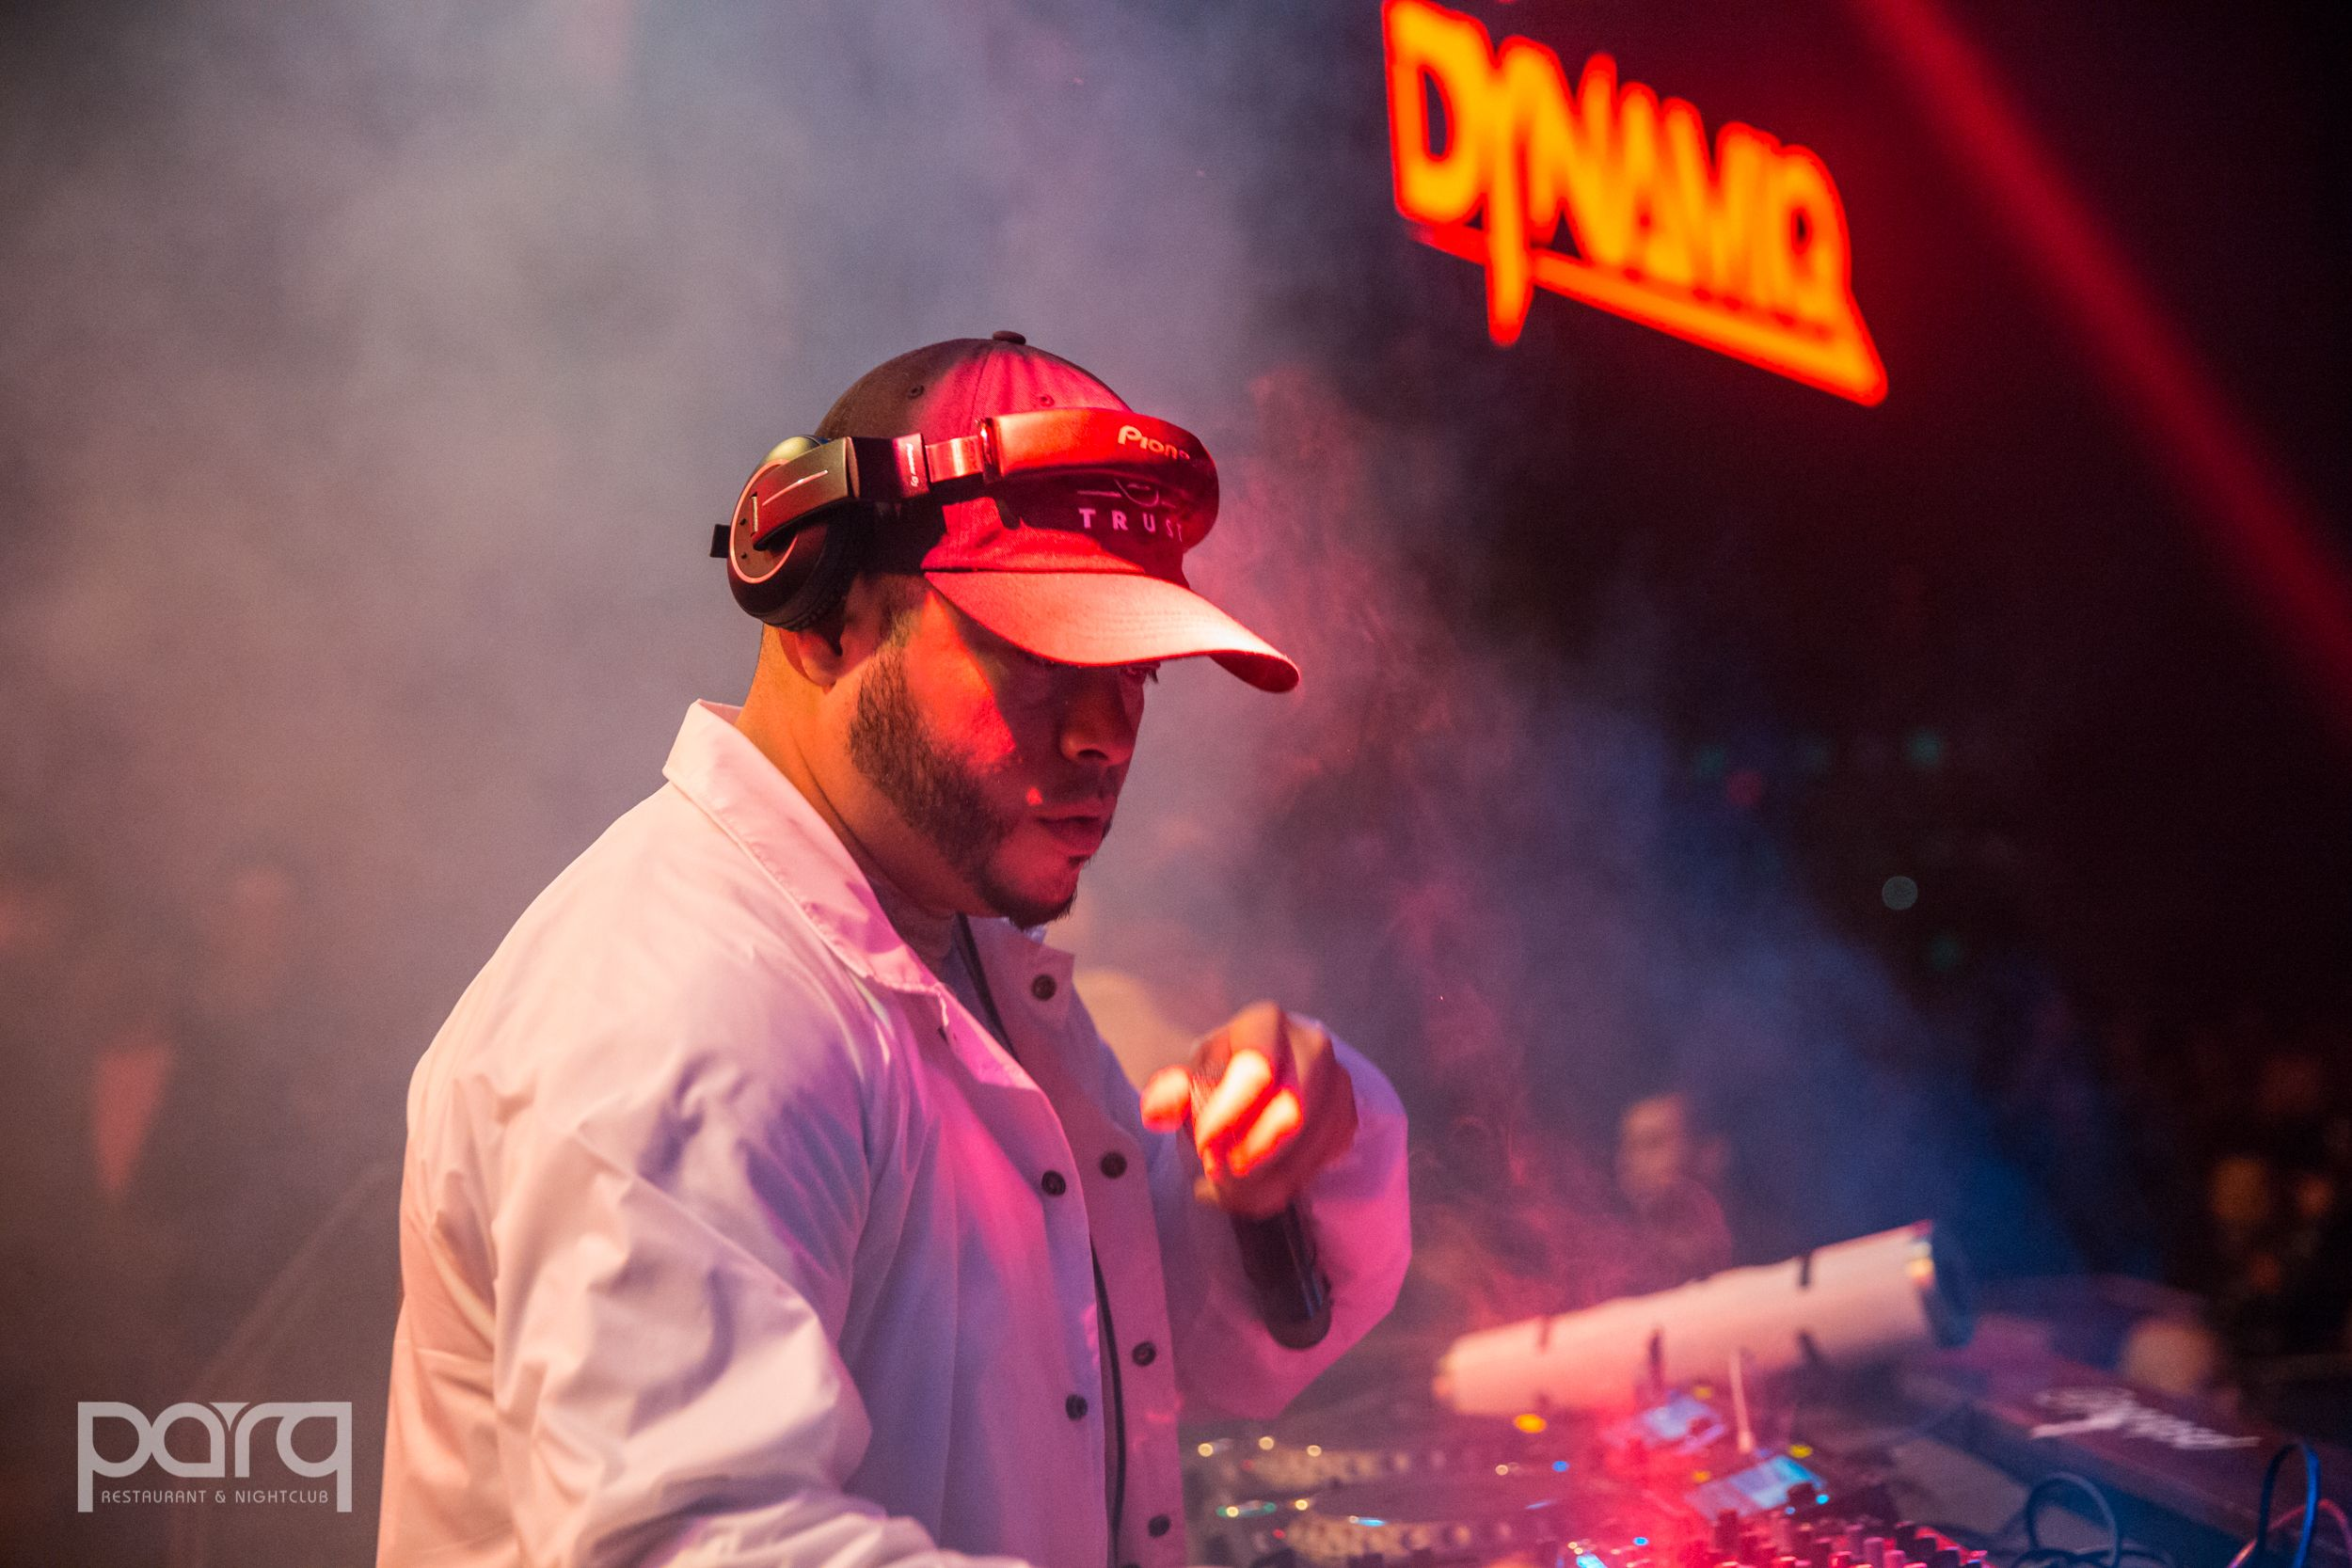 02.18.18 Parq - DJ Drama-13.jpg